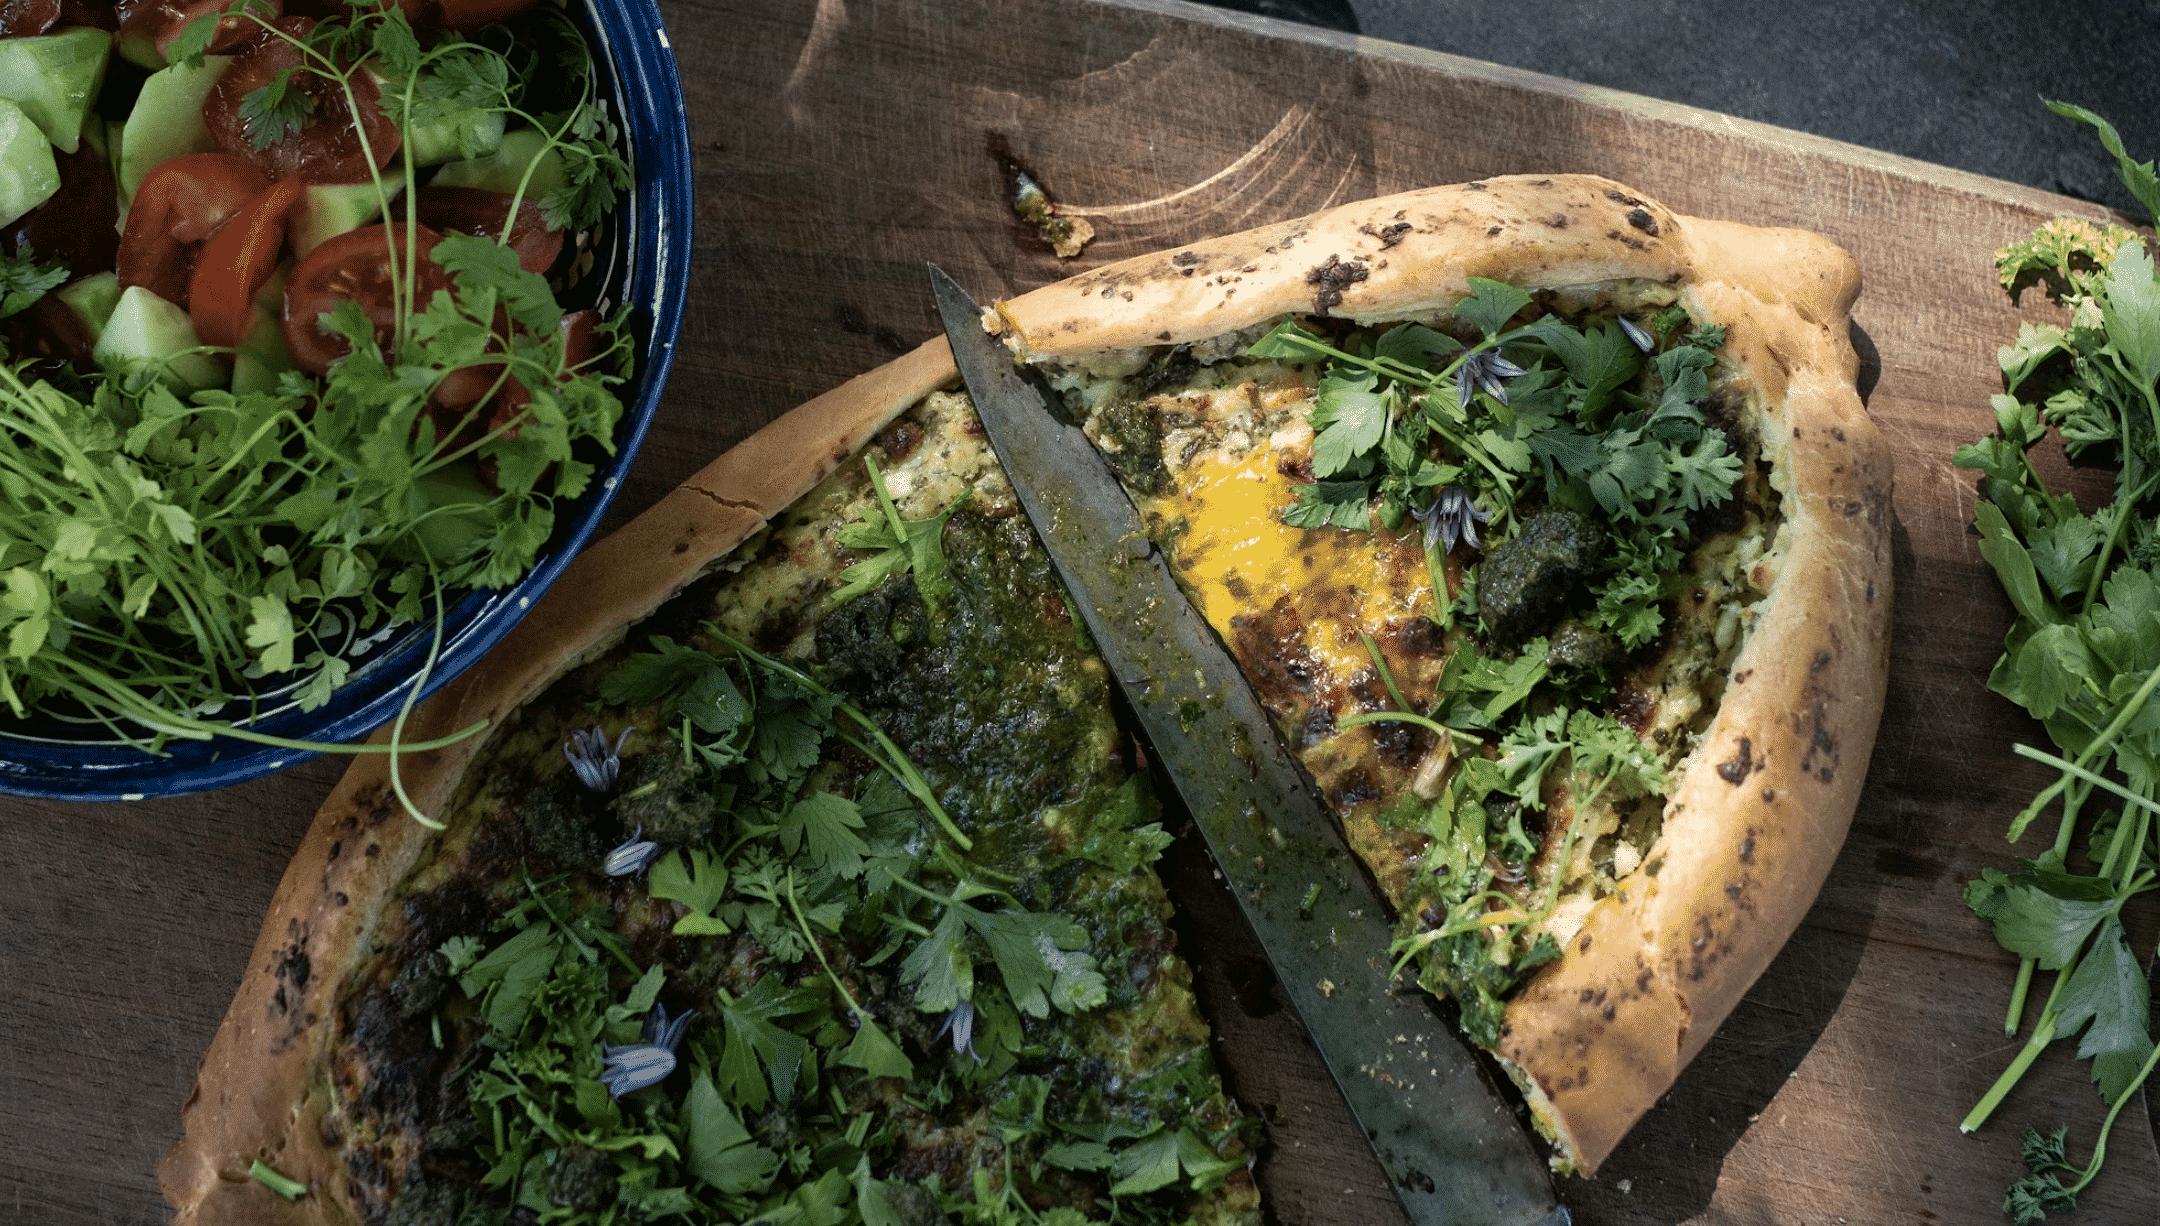 Georgisk inspireret khachapuri med krydderurter, hytteost og salattern